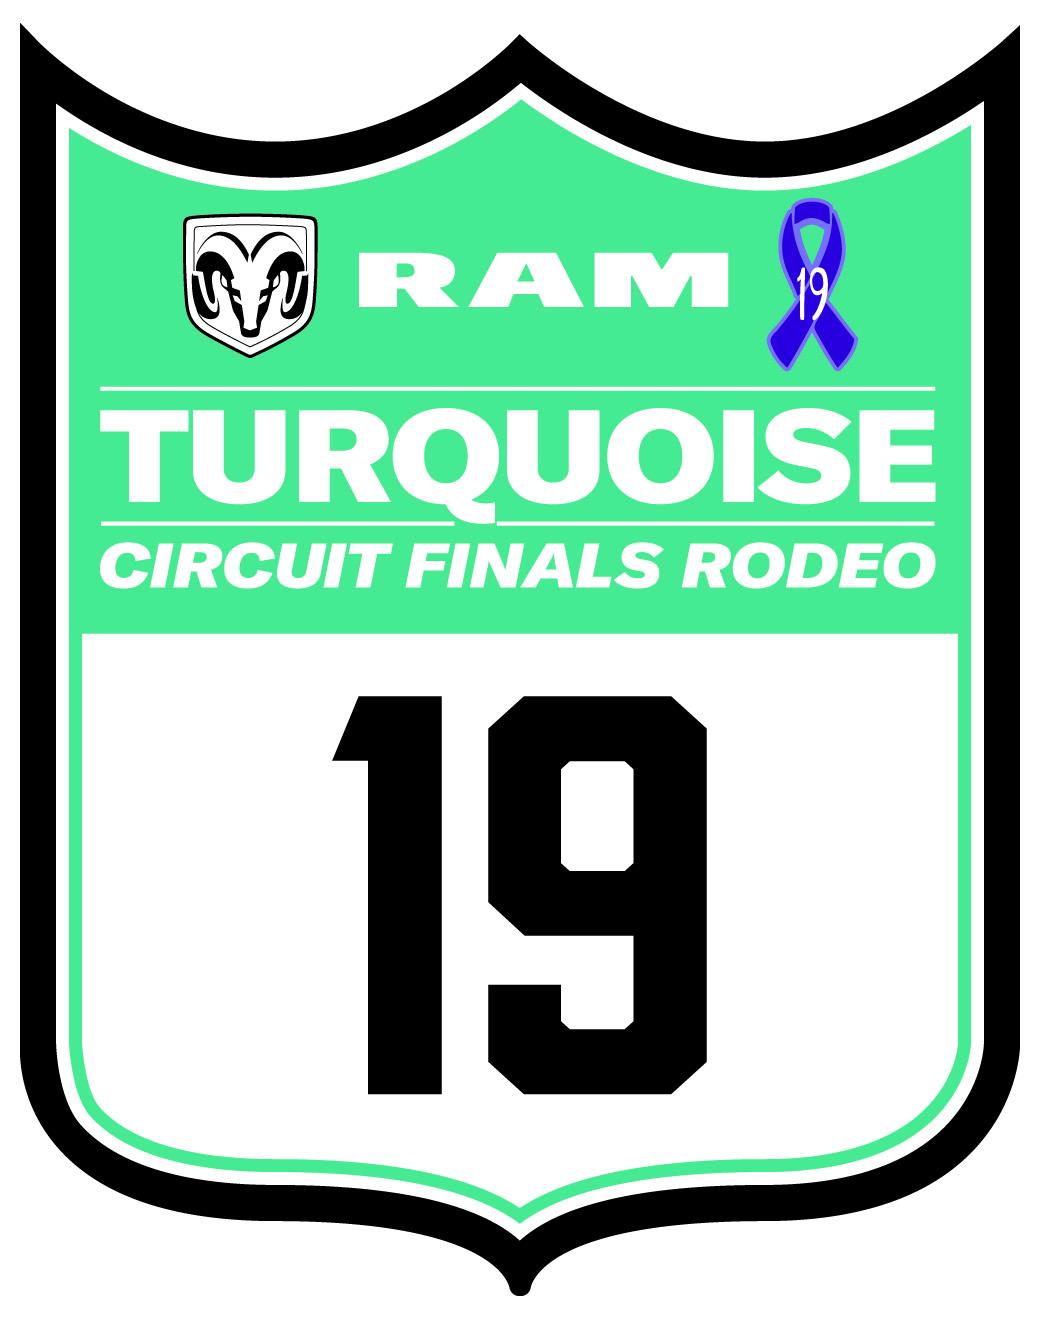 PRCA RAM Turquoise Circuit Finals feltback (1).jpg